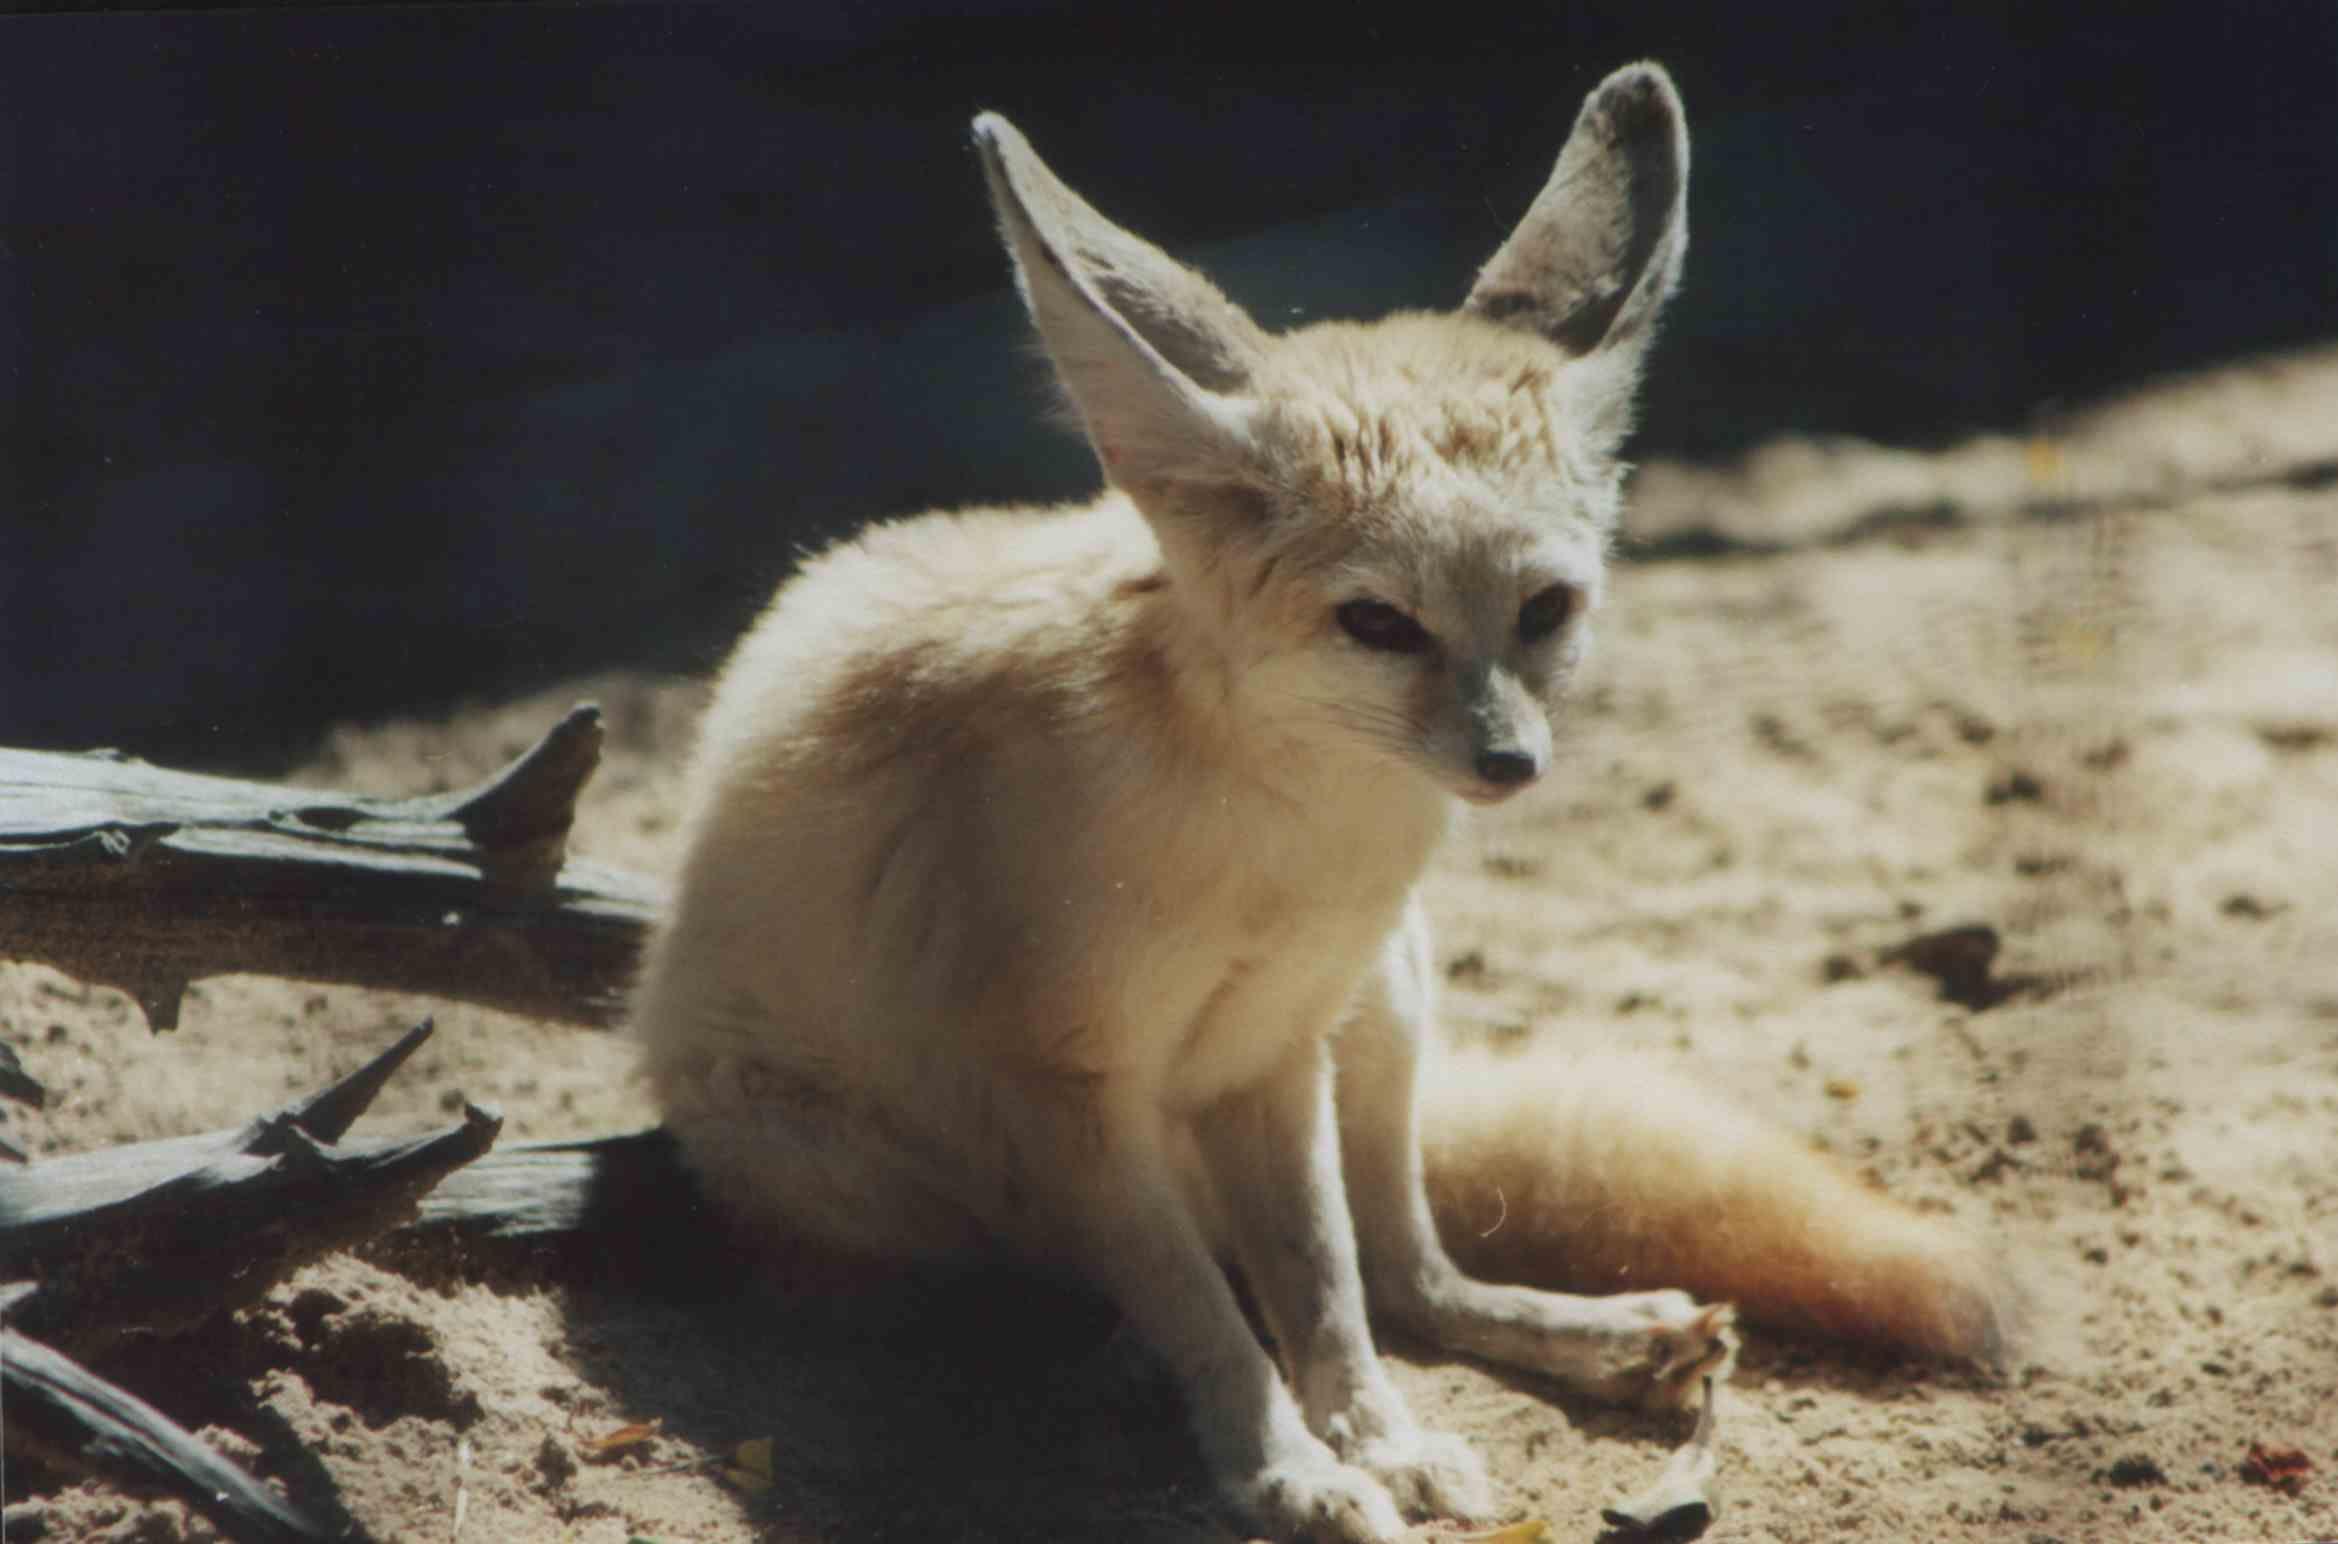 The Fennec Fox Vulpes Zerda Is A Small Nocturnal Fox